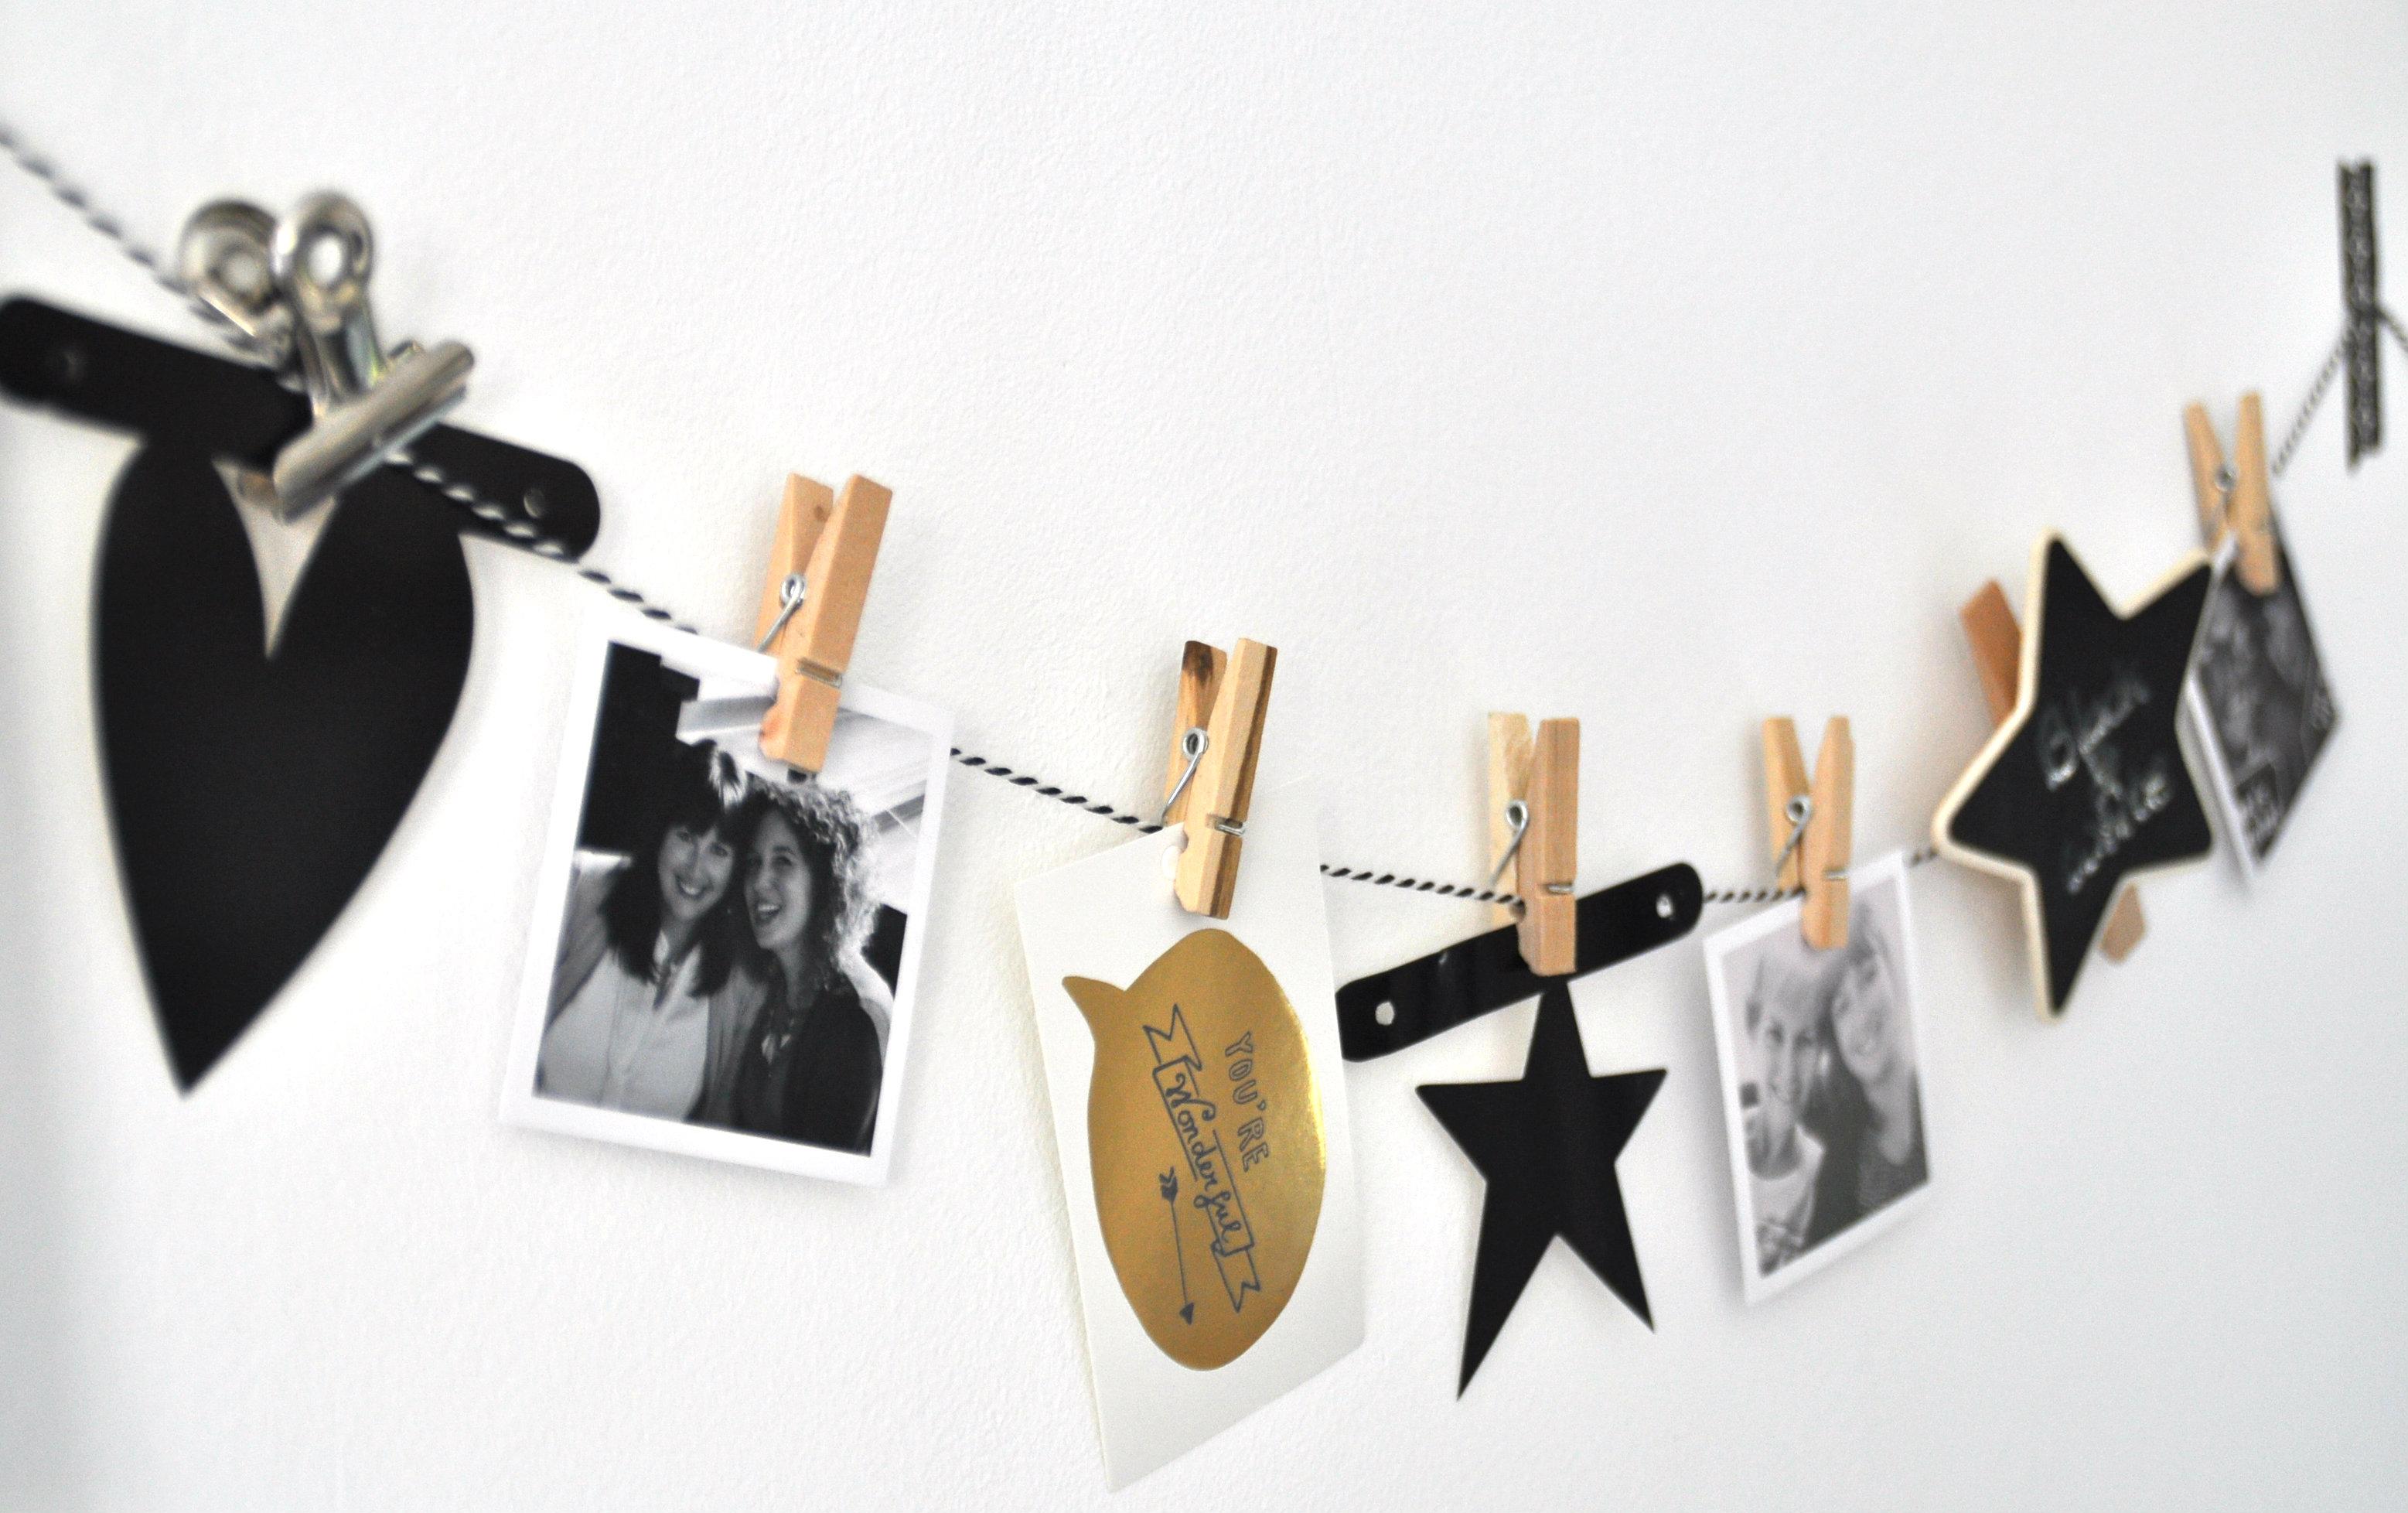 Spiksplinternieuw Feestje in zwart & wit: ideeën & decoratie-inspiratie! AG-86